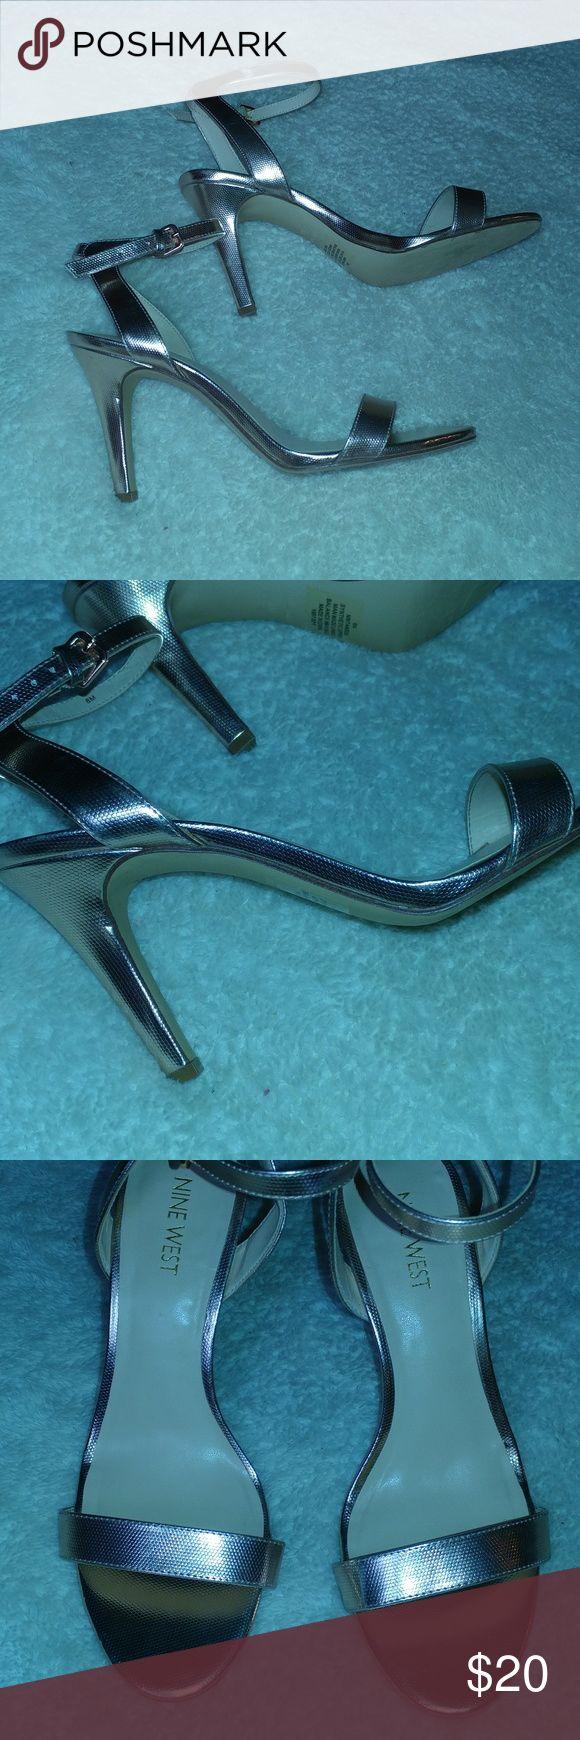 ROSE GOLD strappy high heel sandals ROSE GOLD strappy high heel sandals, NWOT, never worn Nine West Shoes Heels